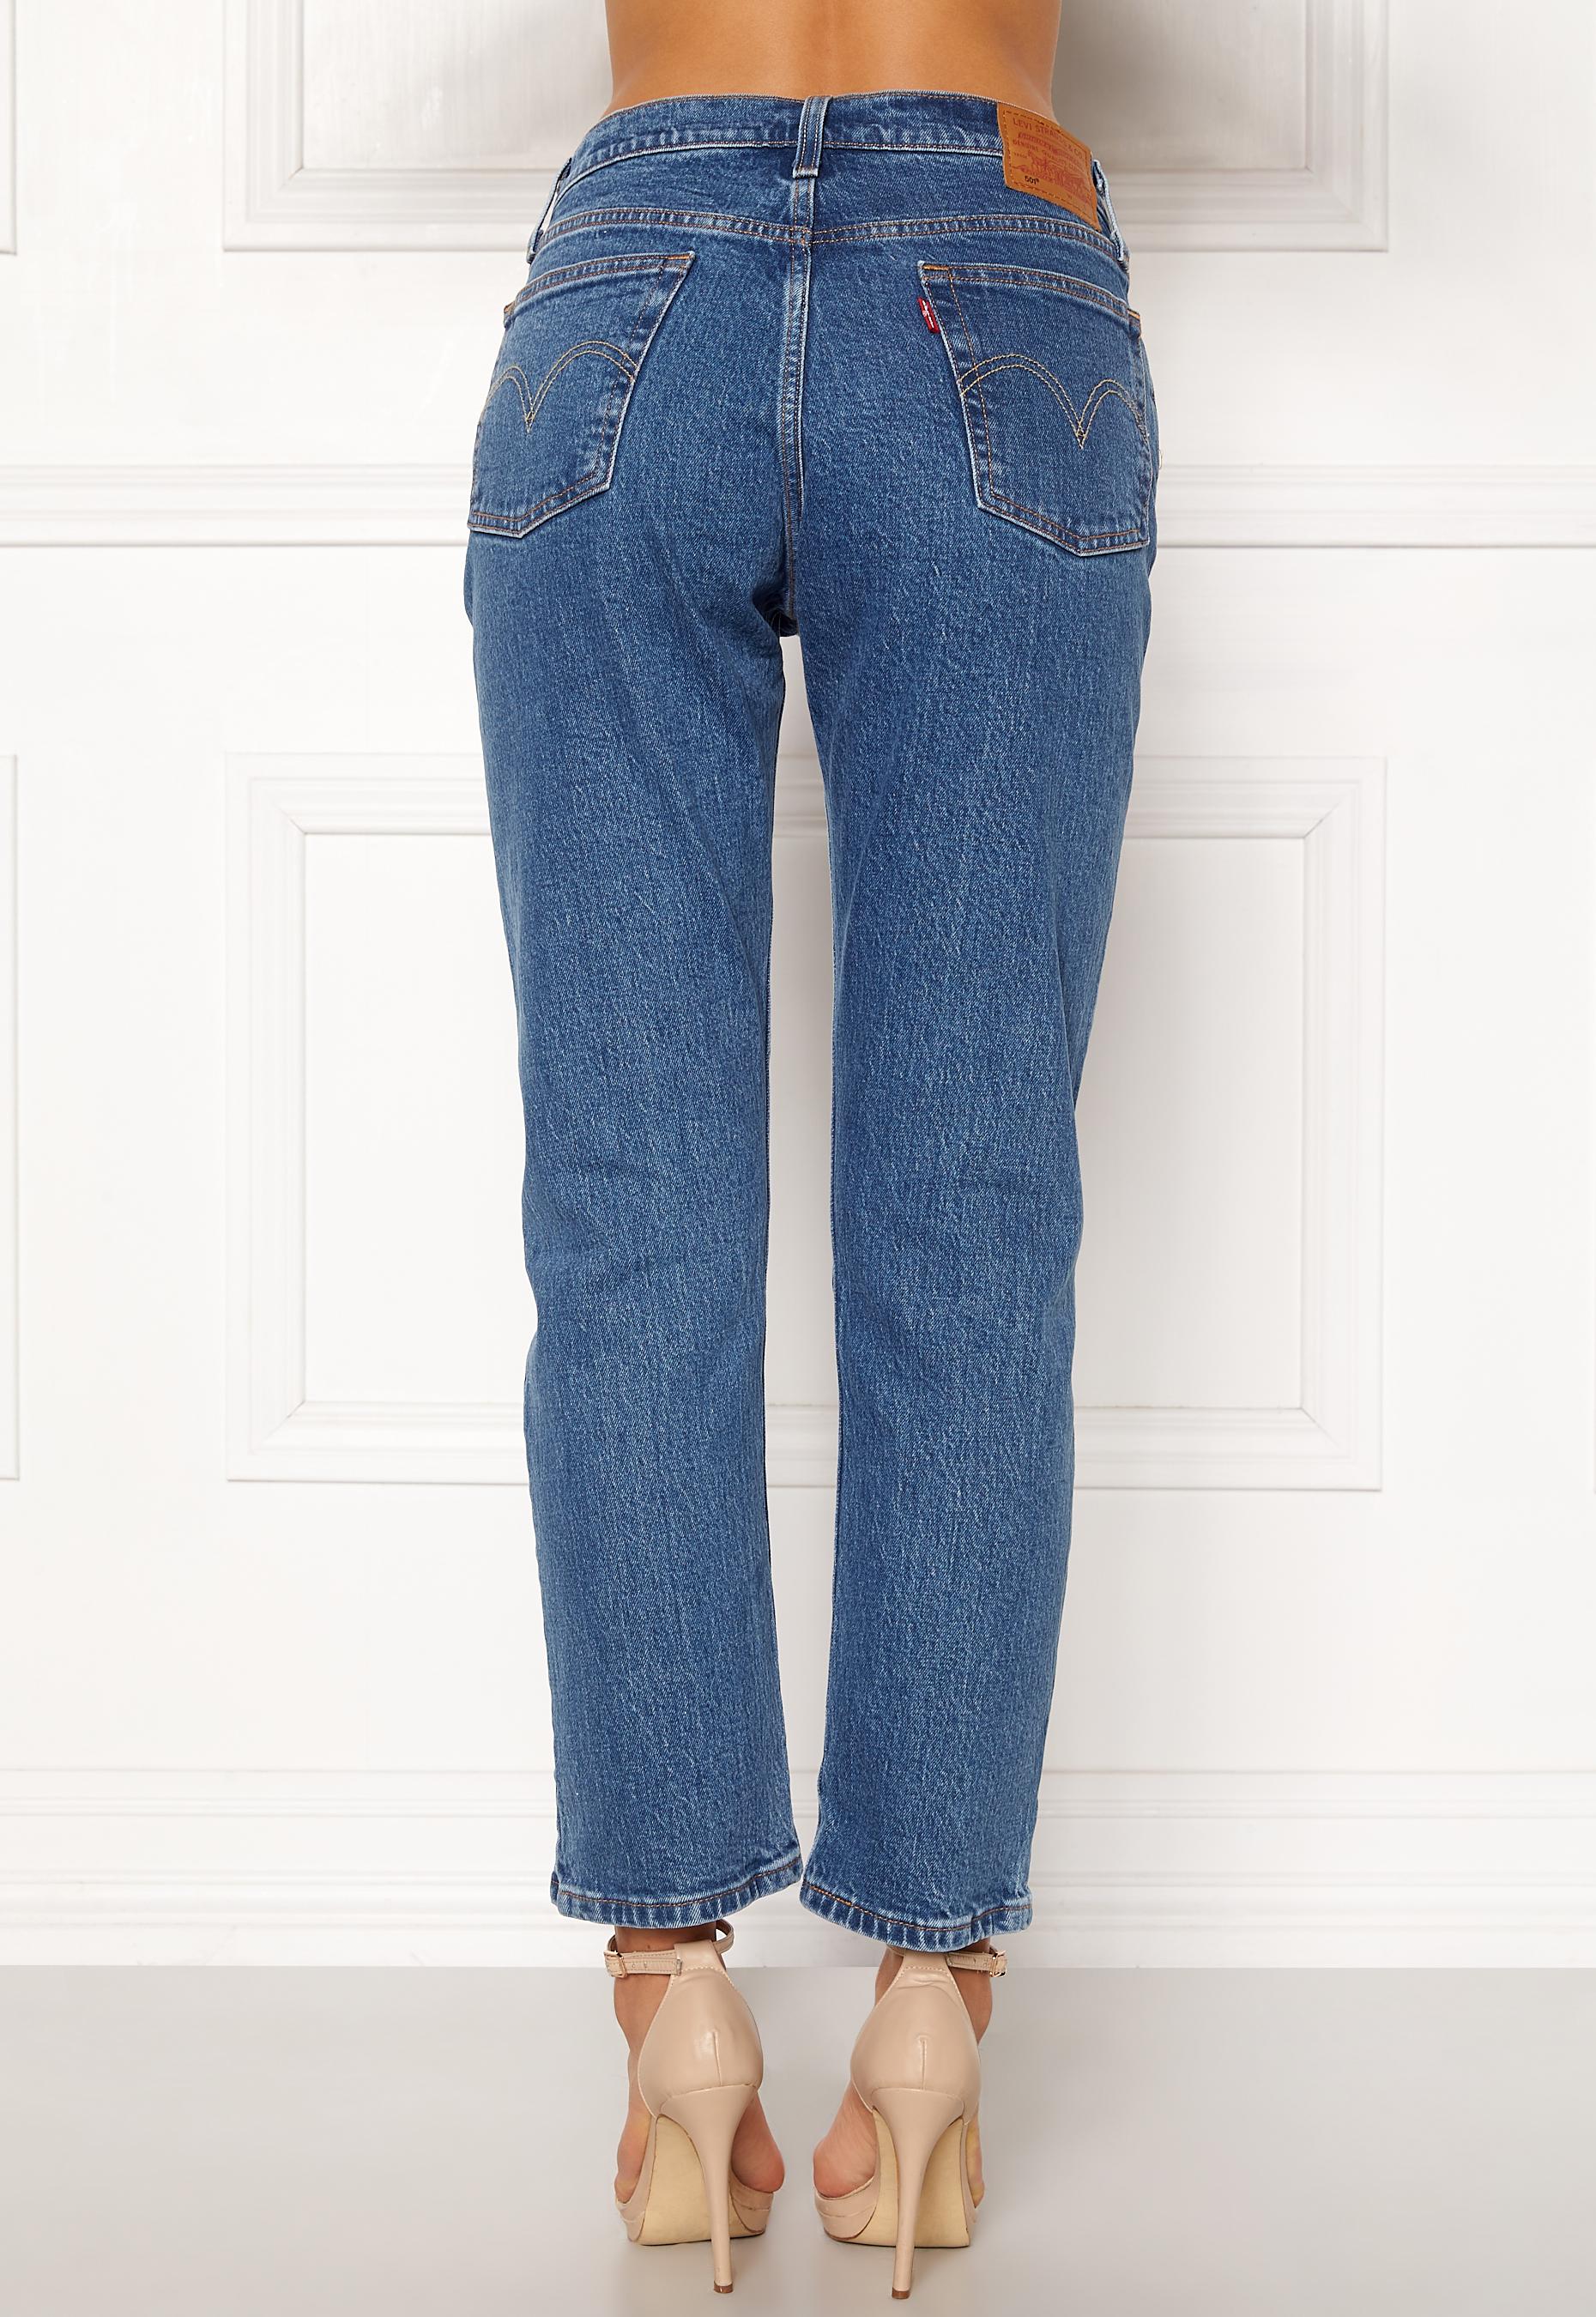 Levi's Jeans 501 Crop Jive Stonewash